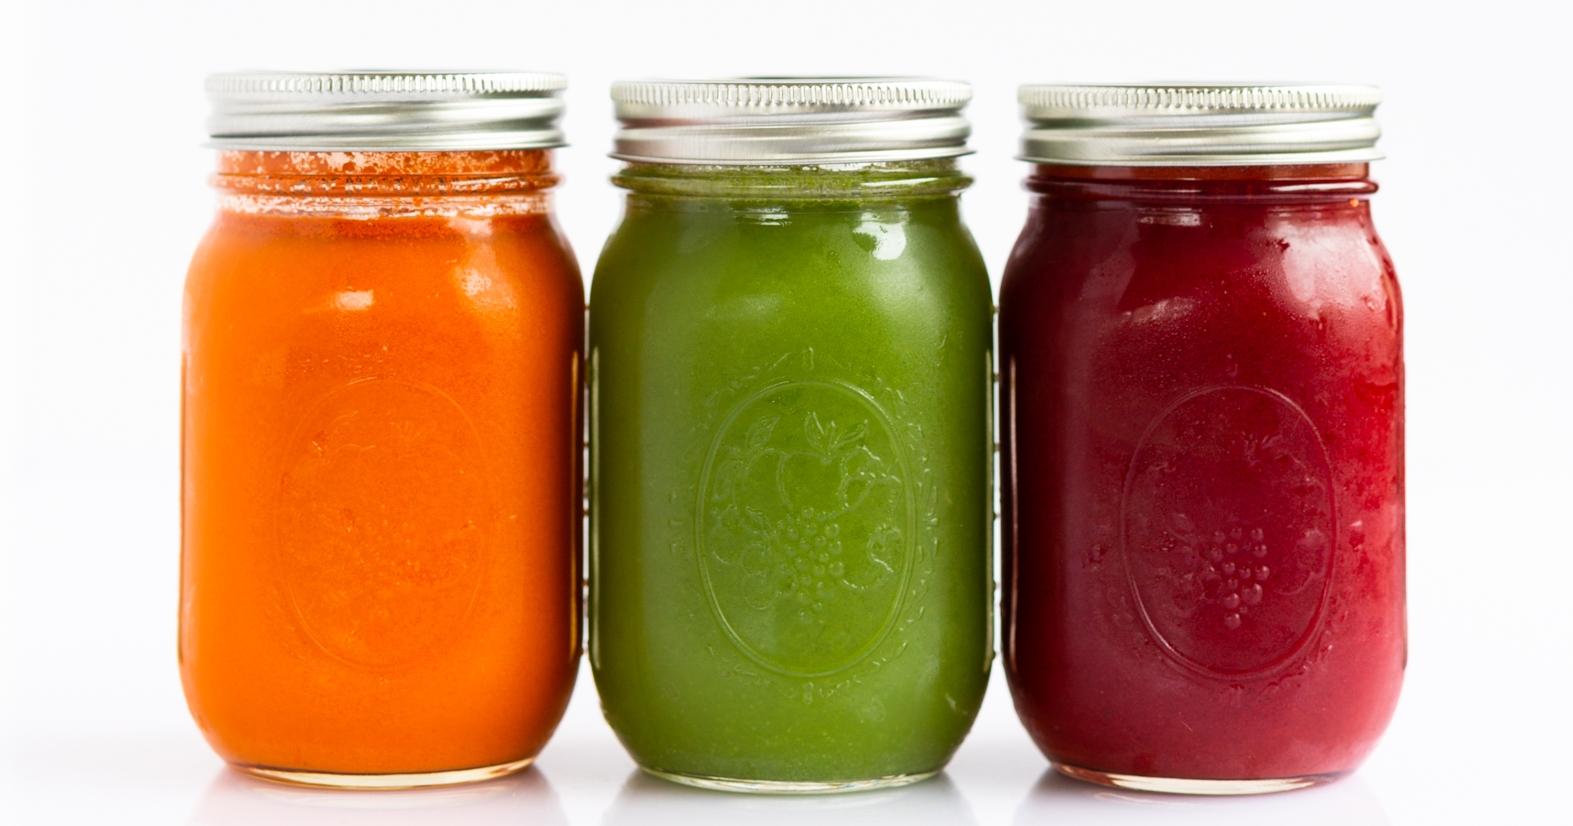 - fresh pressed juices